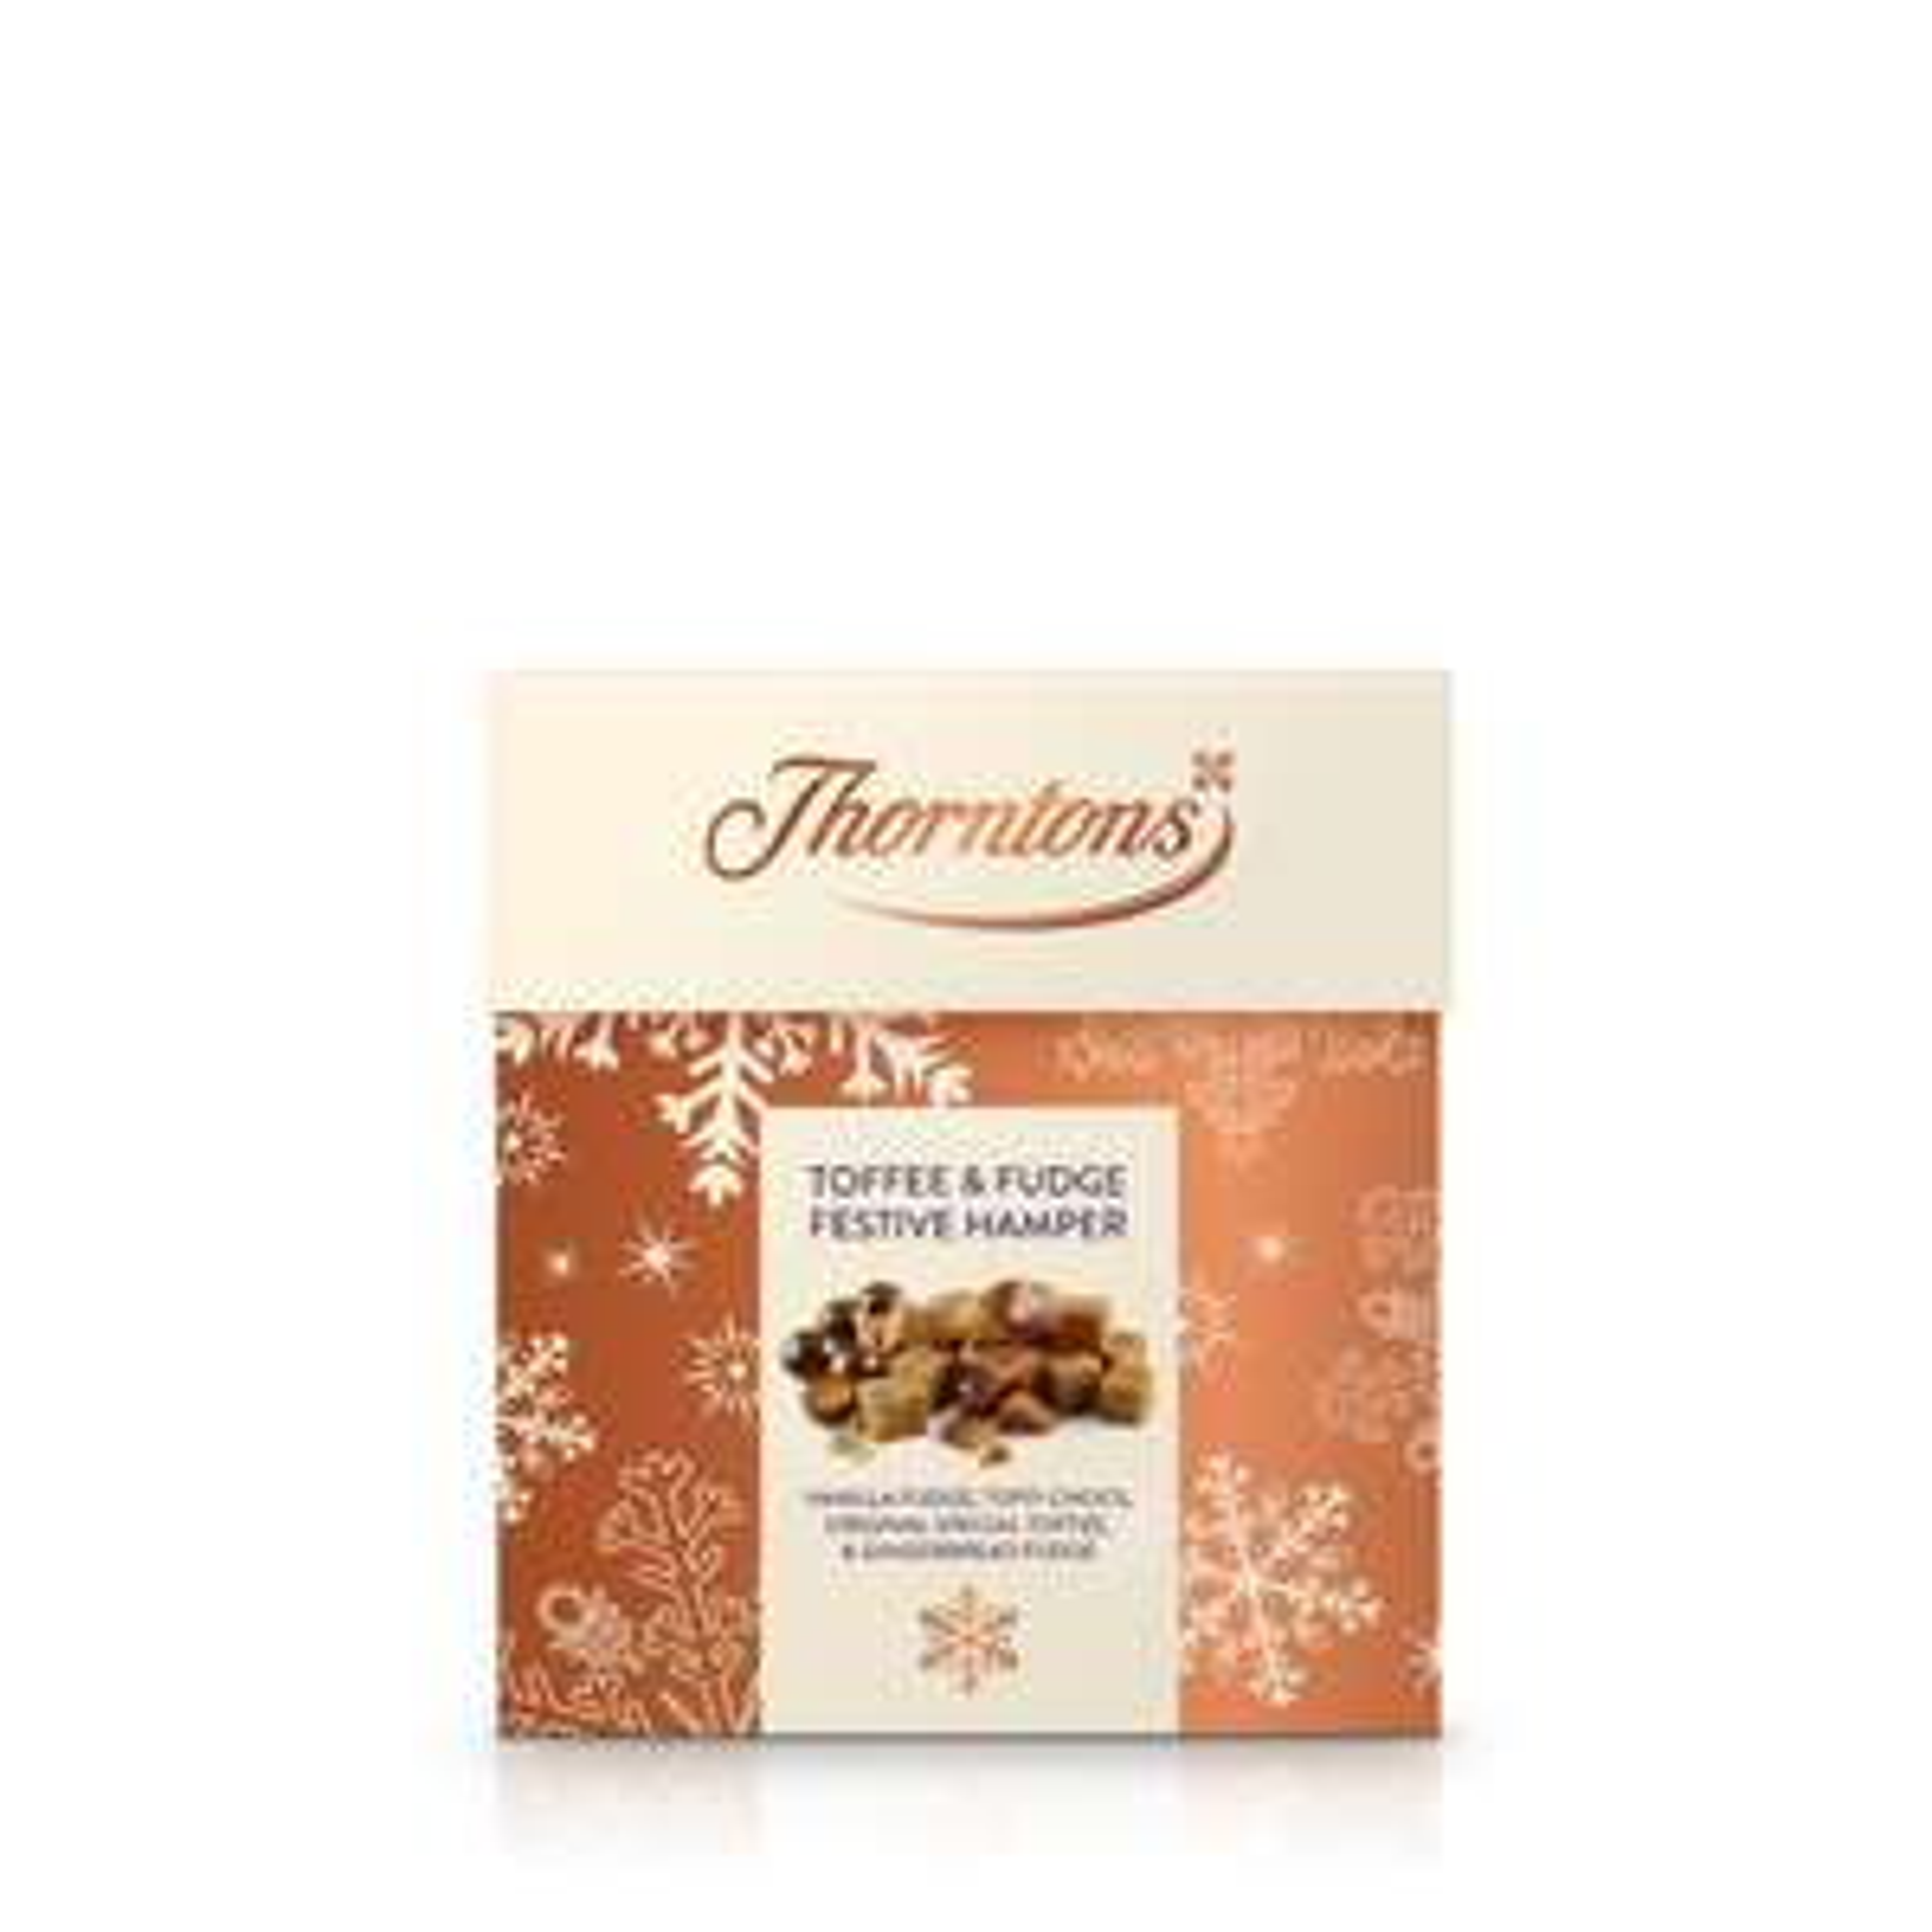 Thorntons Toffee Fudge Festive Hamper (575g) £2.70 + £3.95 postage